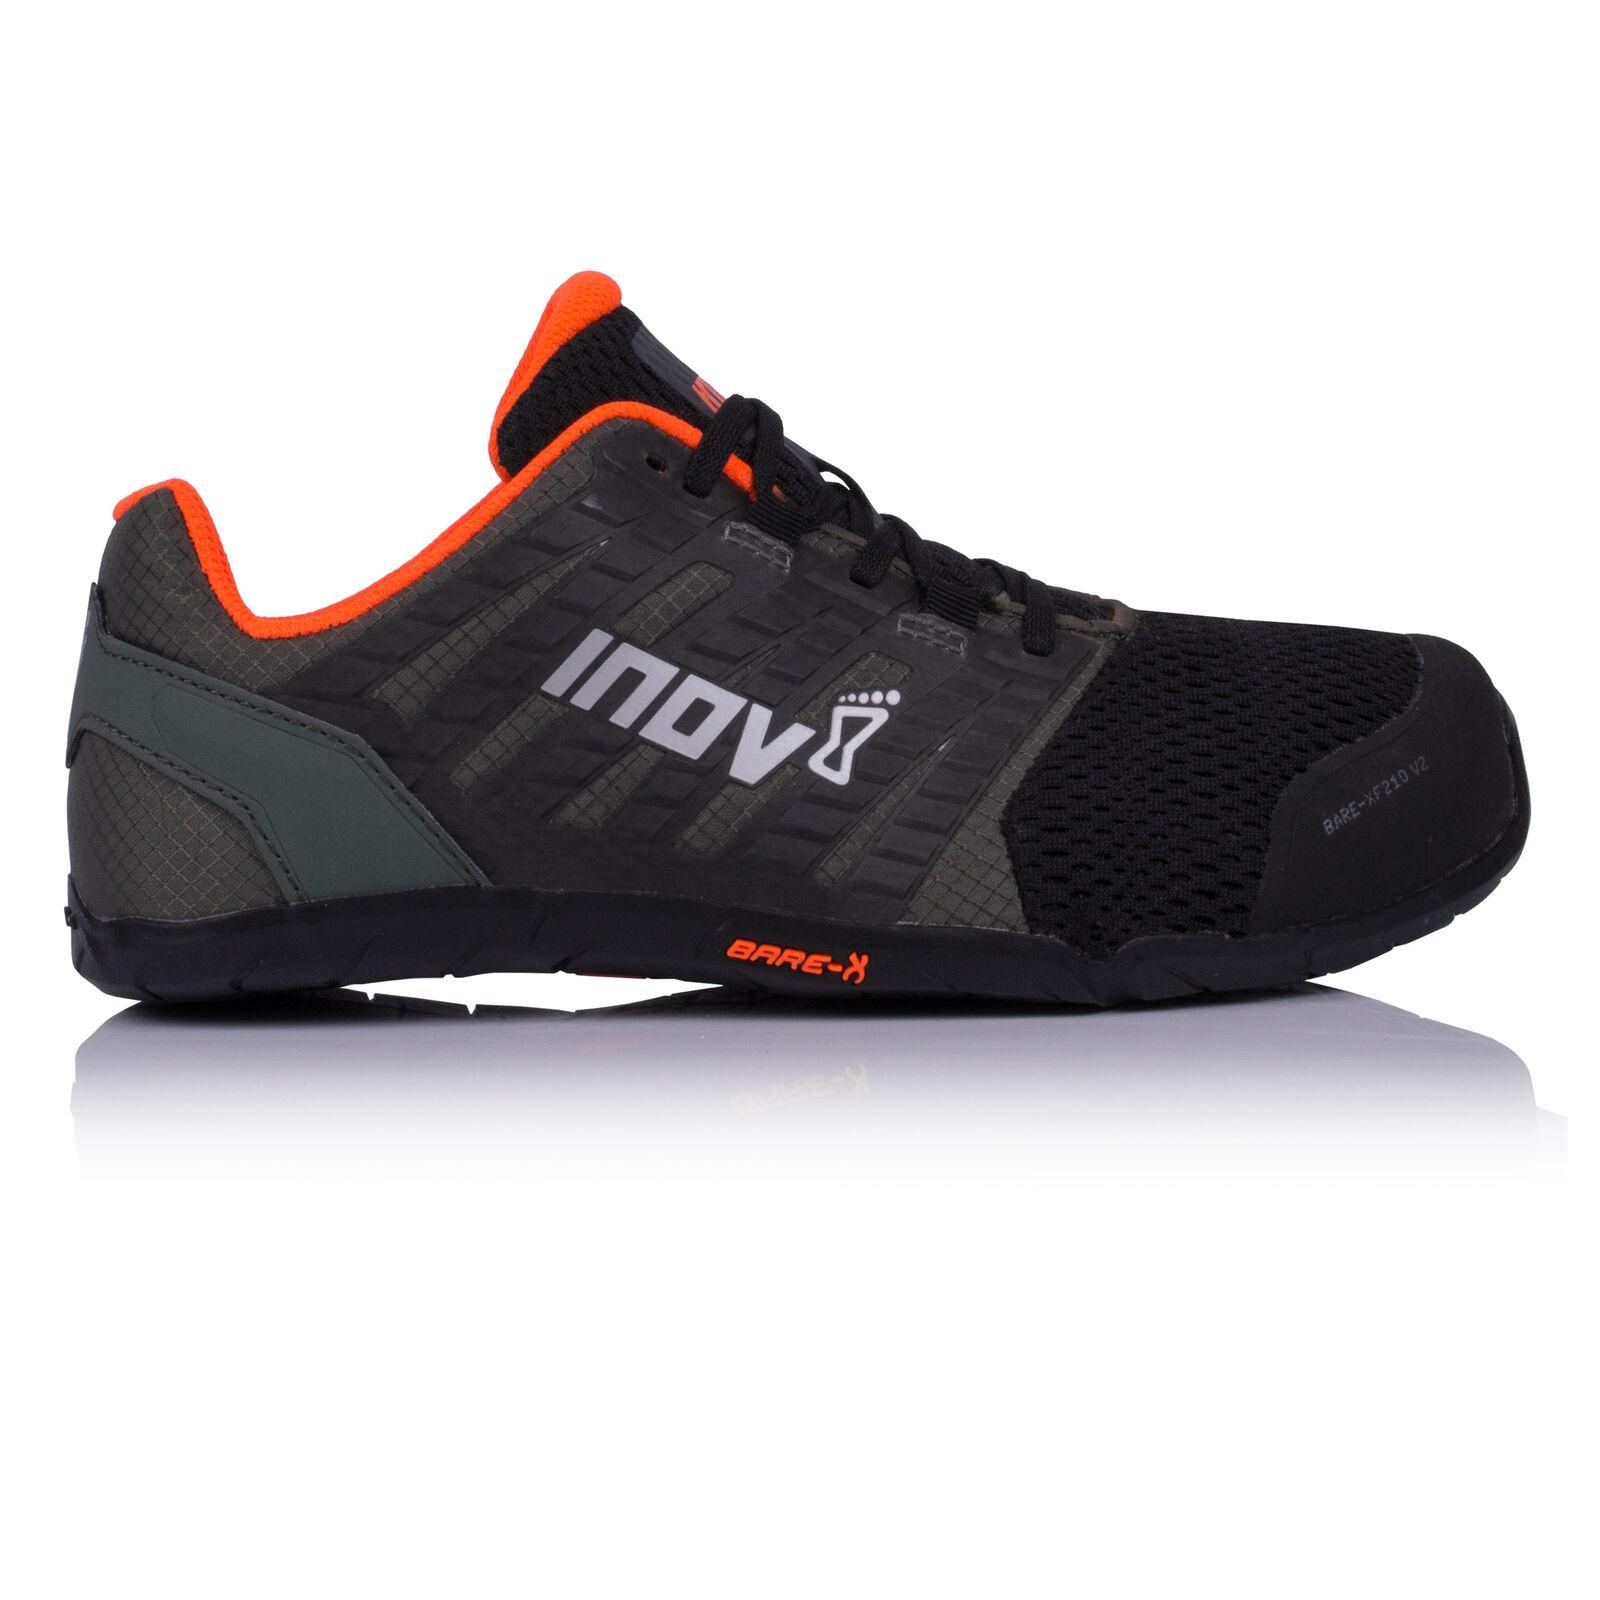 Inov8 Hommes Bare-Xf Baskets 210 V2 Gym Baskets Bare-Xf Chaussures De Sport Noir Vert Orange 70a44d